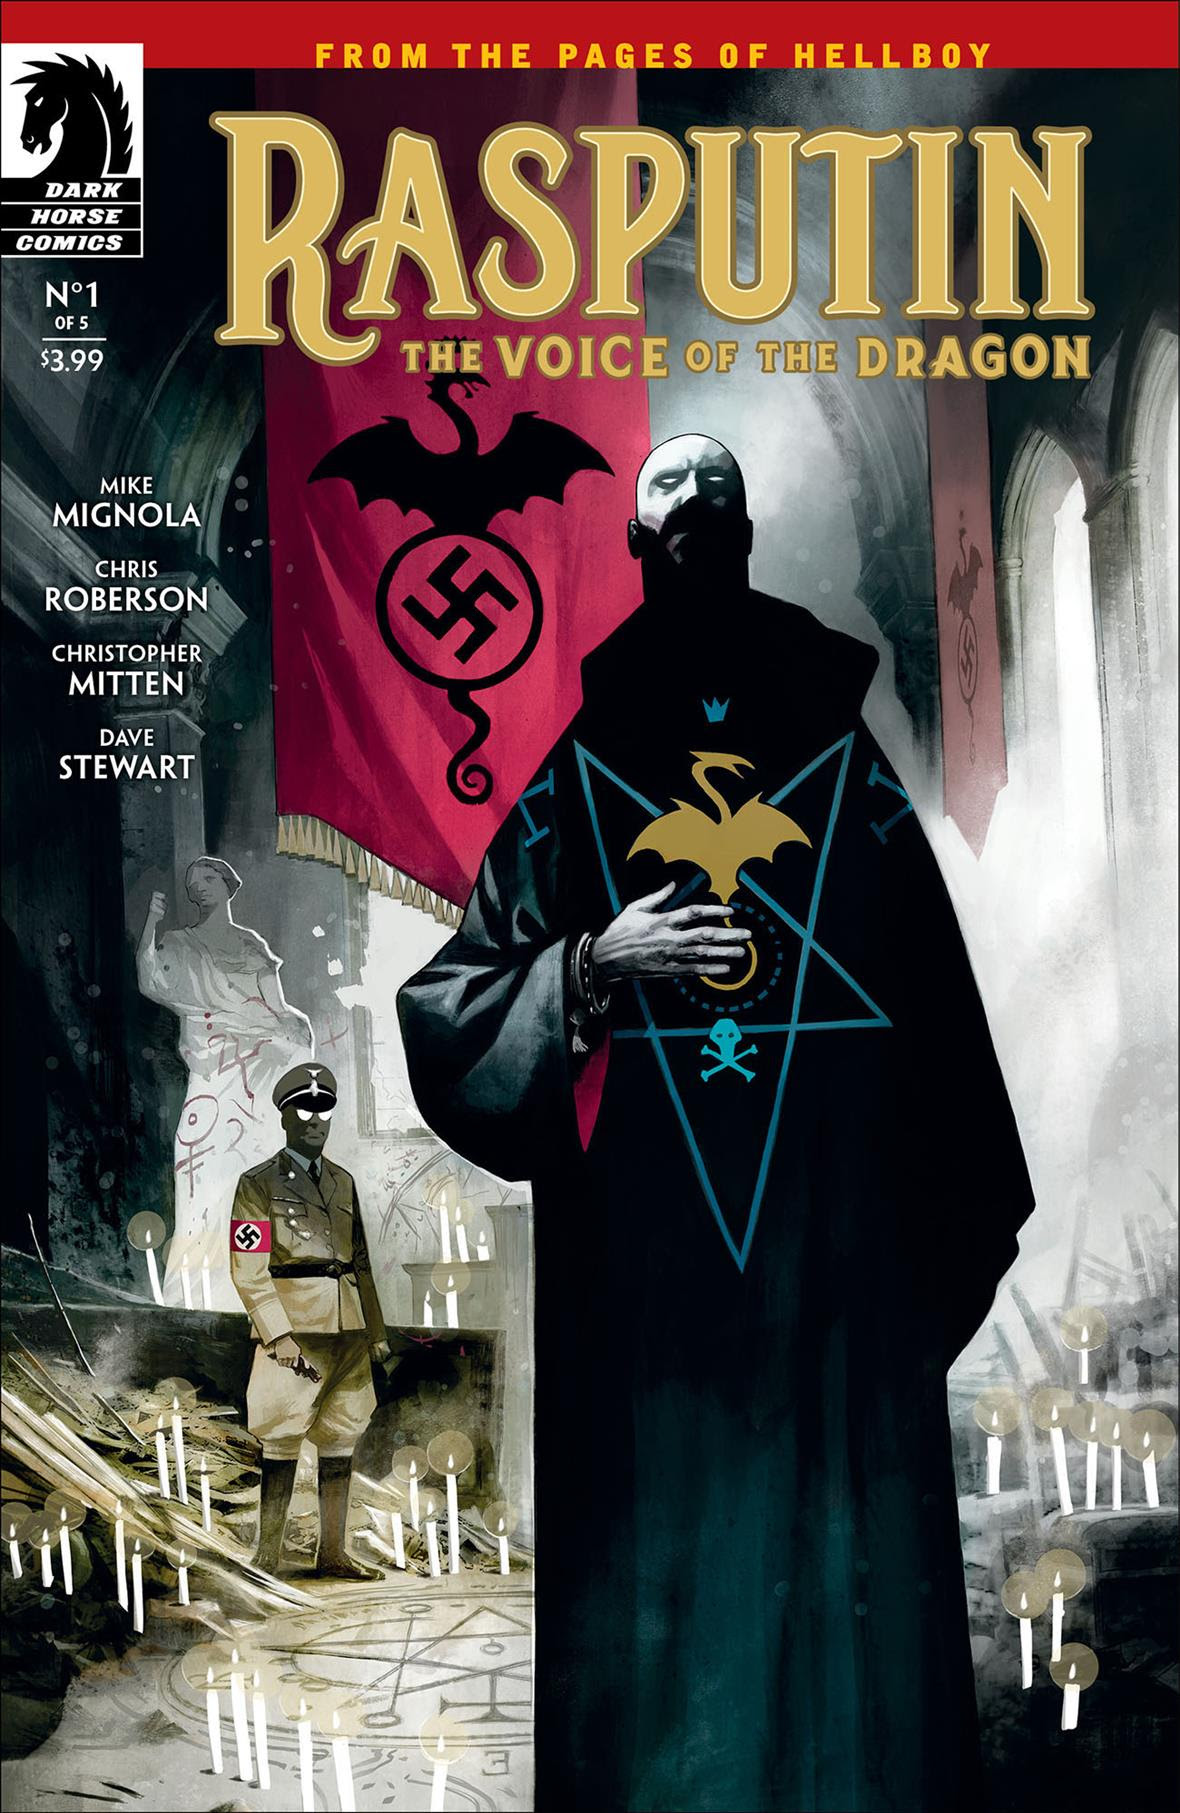 Dark Horse Comics Previews RASPUTIN: THE VOICE OF THE